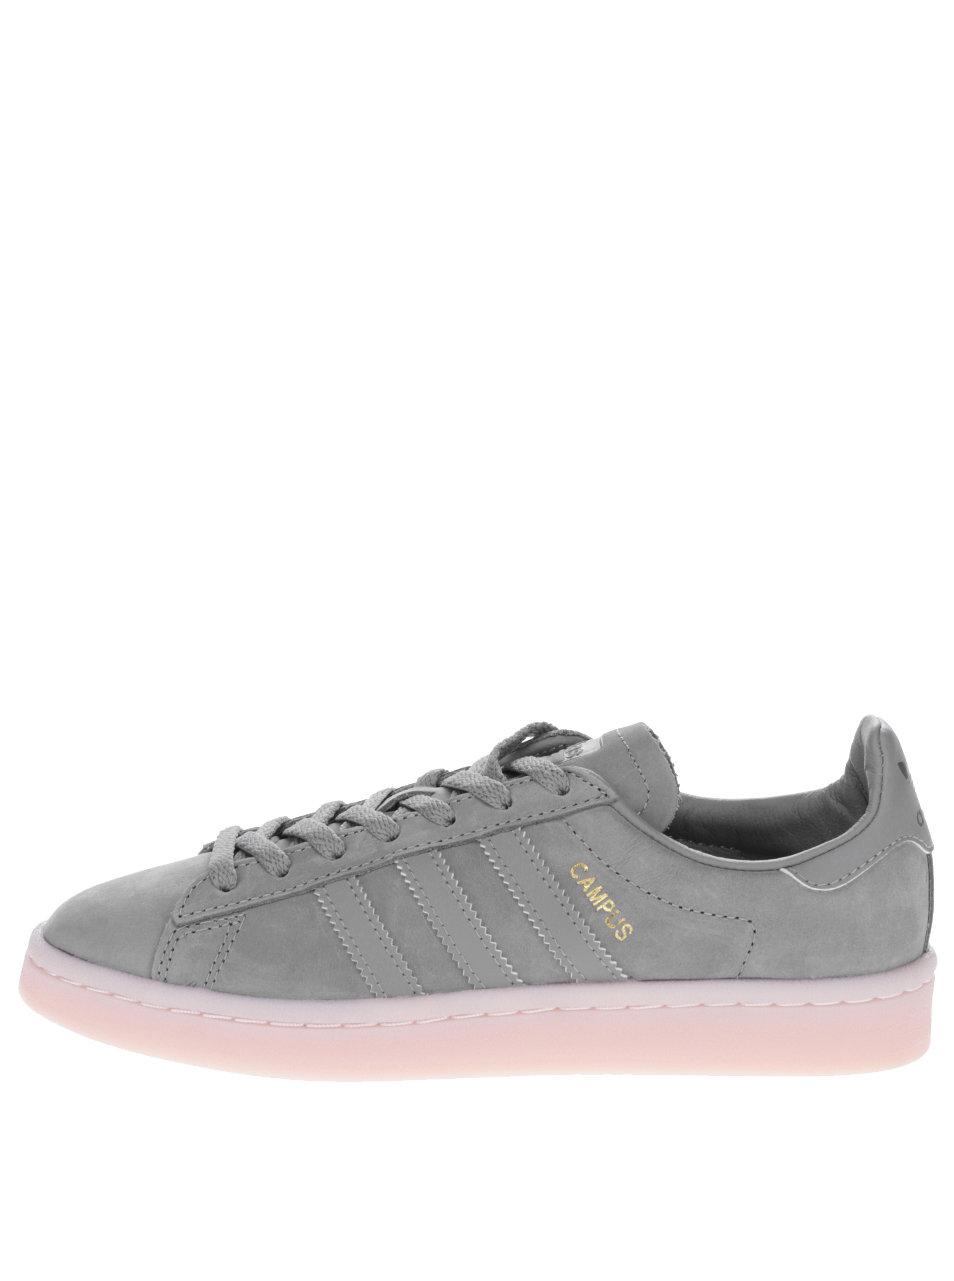 Tmavosivé dámske kožené tenisky adidas Originals Campus ... 3e0ee7d438